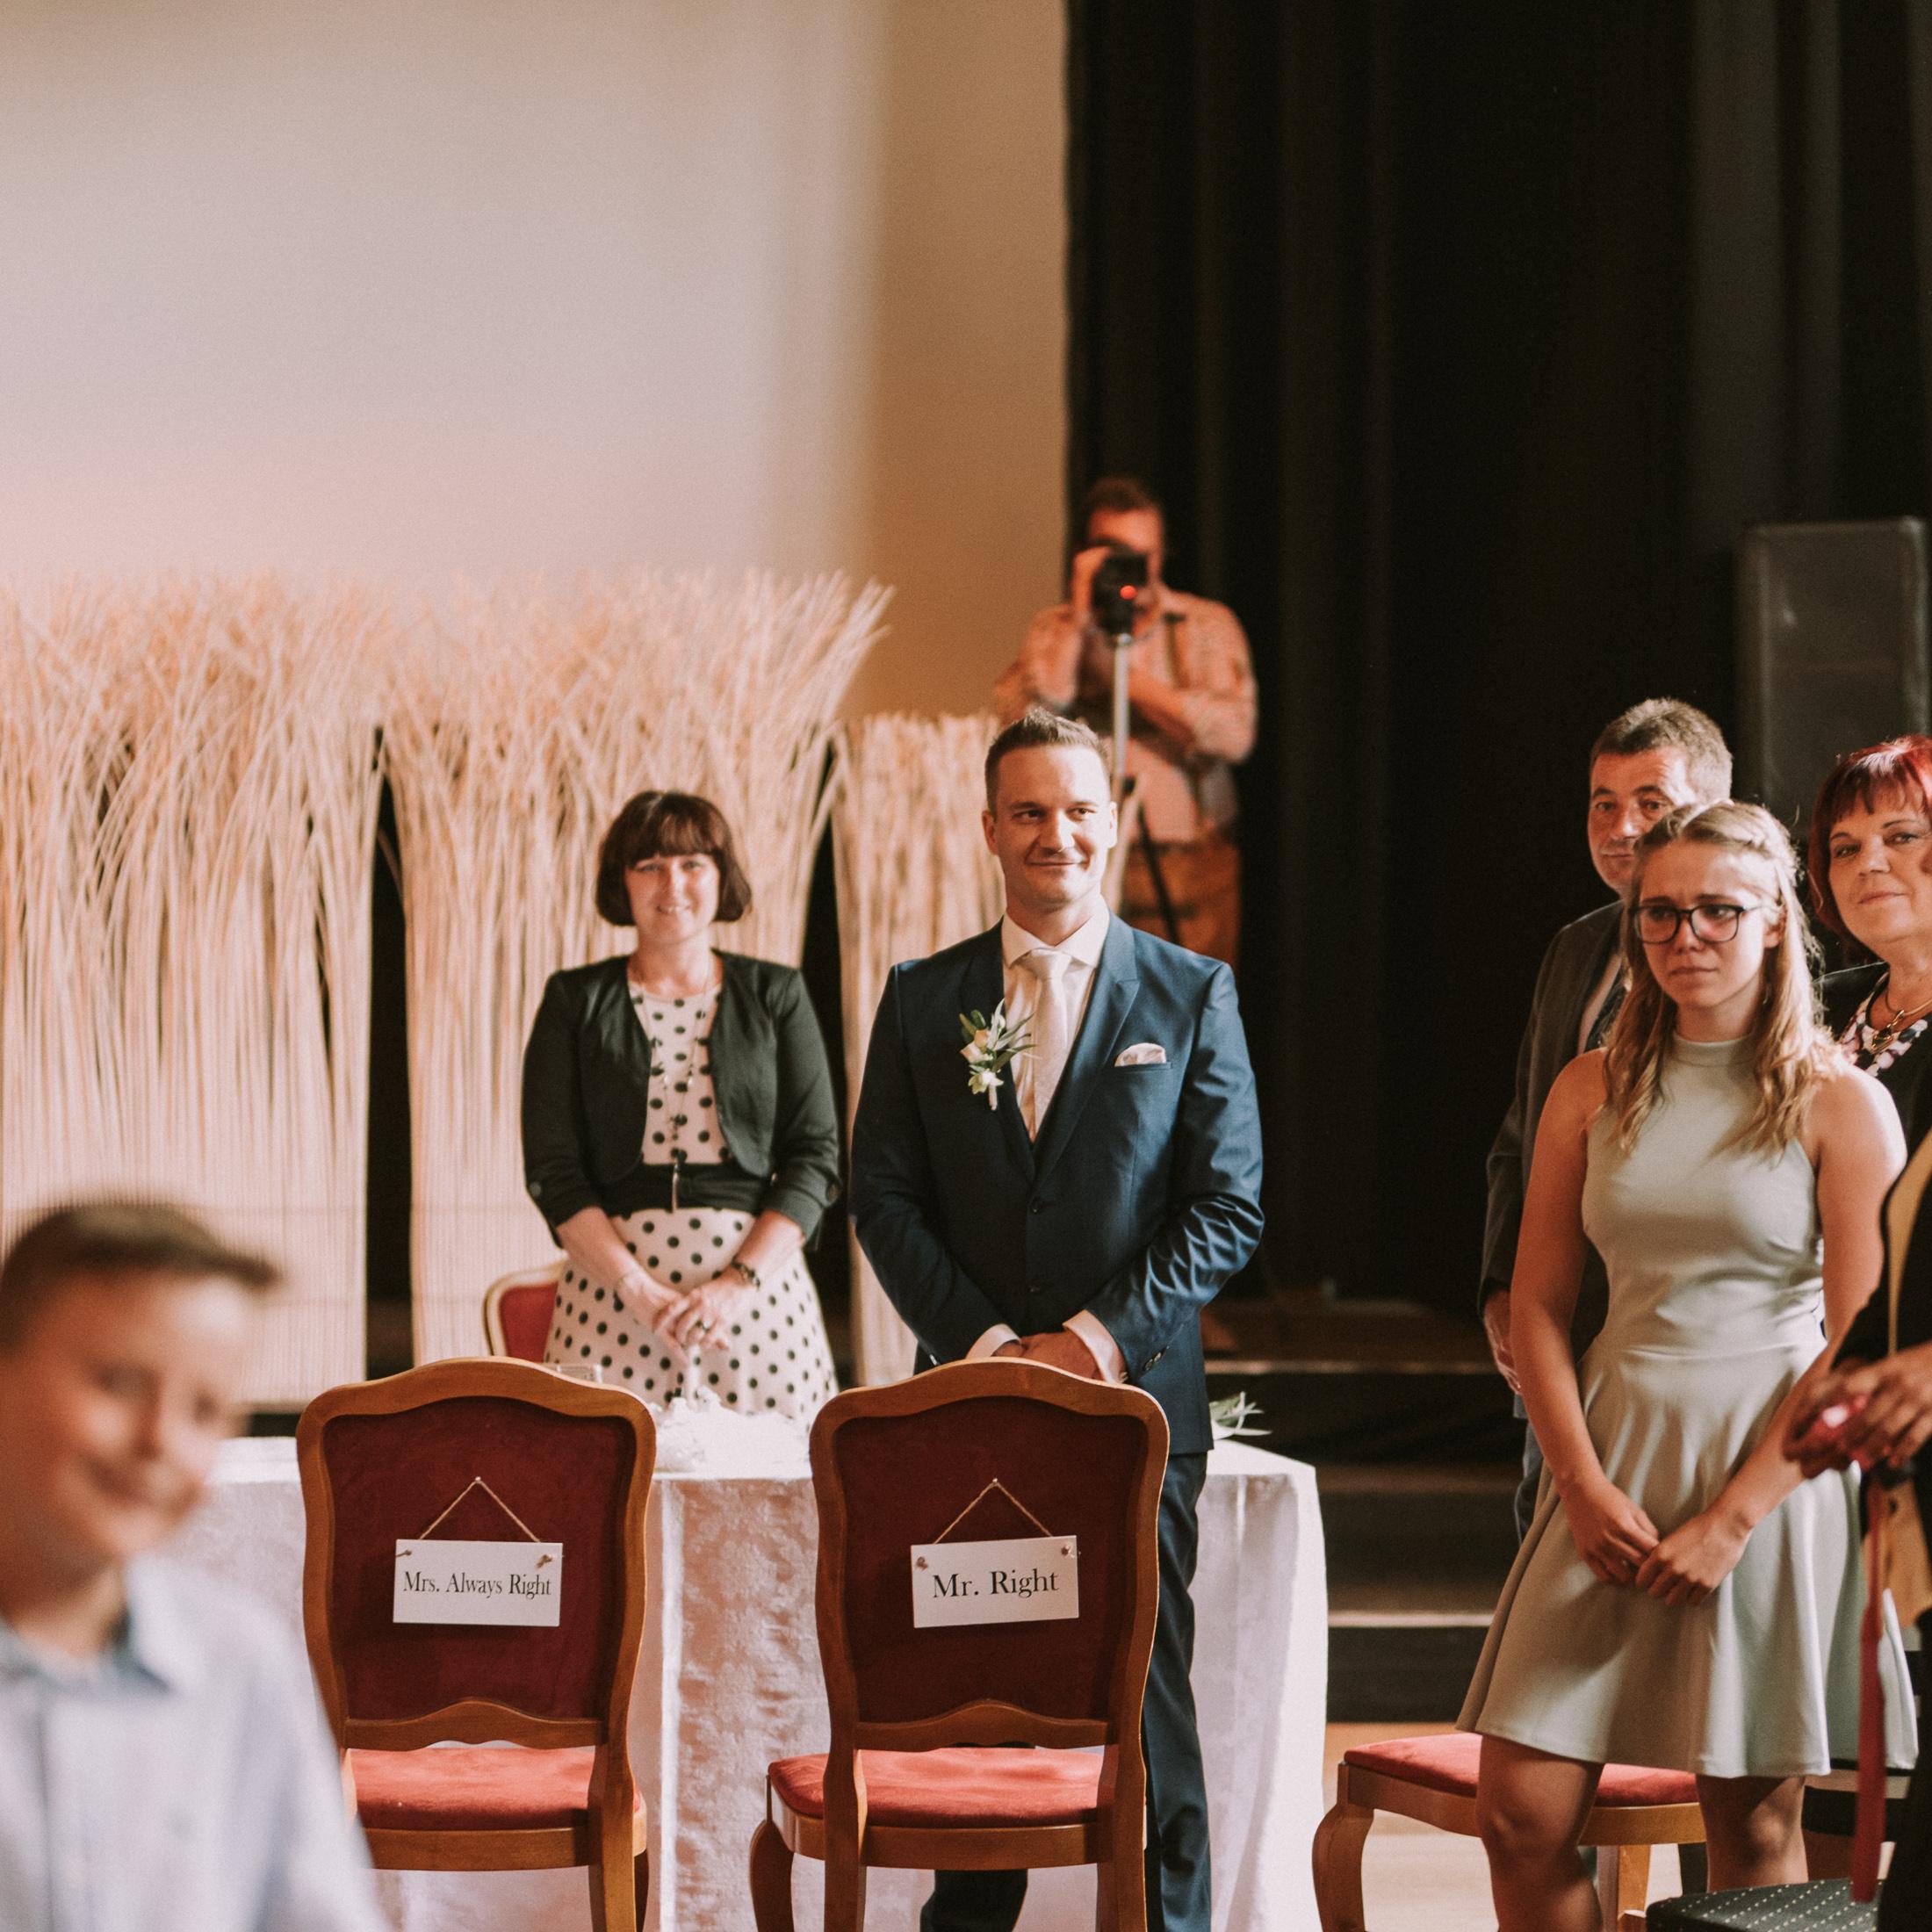 SebastianDon-Hochzeitsfotograf-Wien Umgebung-10.jpg